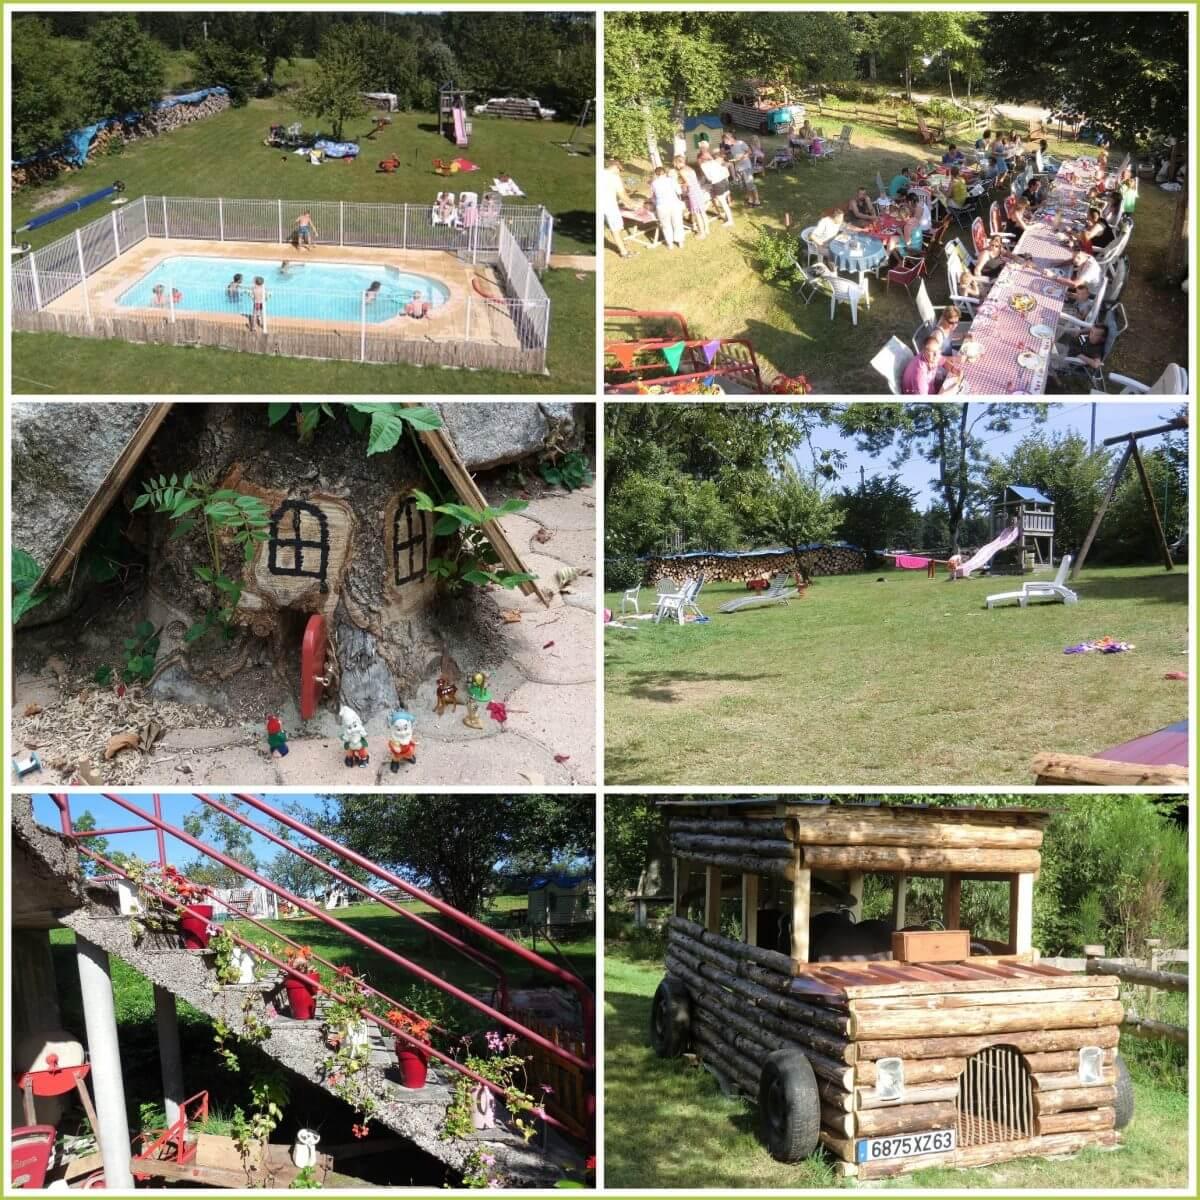 101 leuke idyllische campings in Frankrijk met kids - Domaine Le Sauzet, Saint-Germain-l'Herm, Puy-de-Dôme, Auvergne,